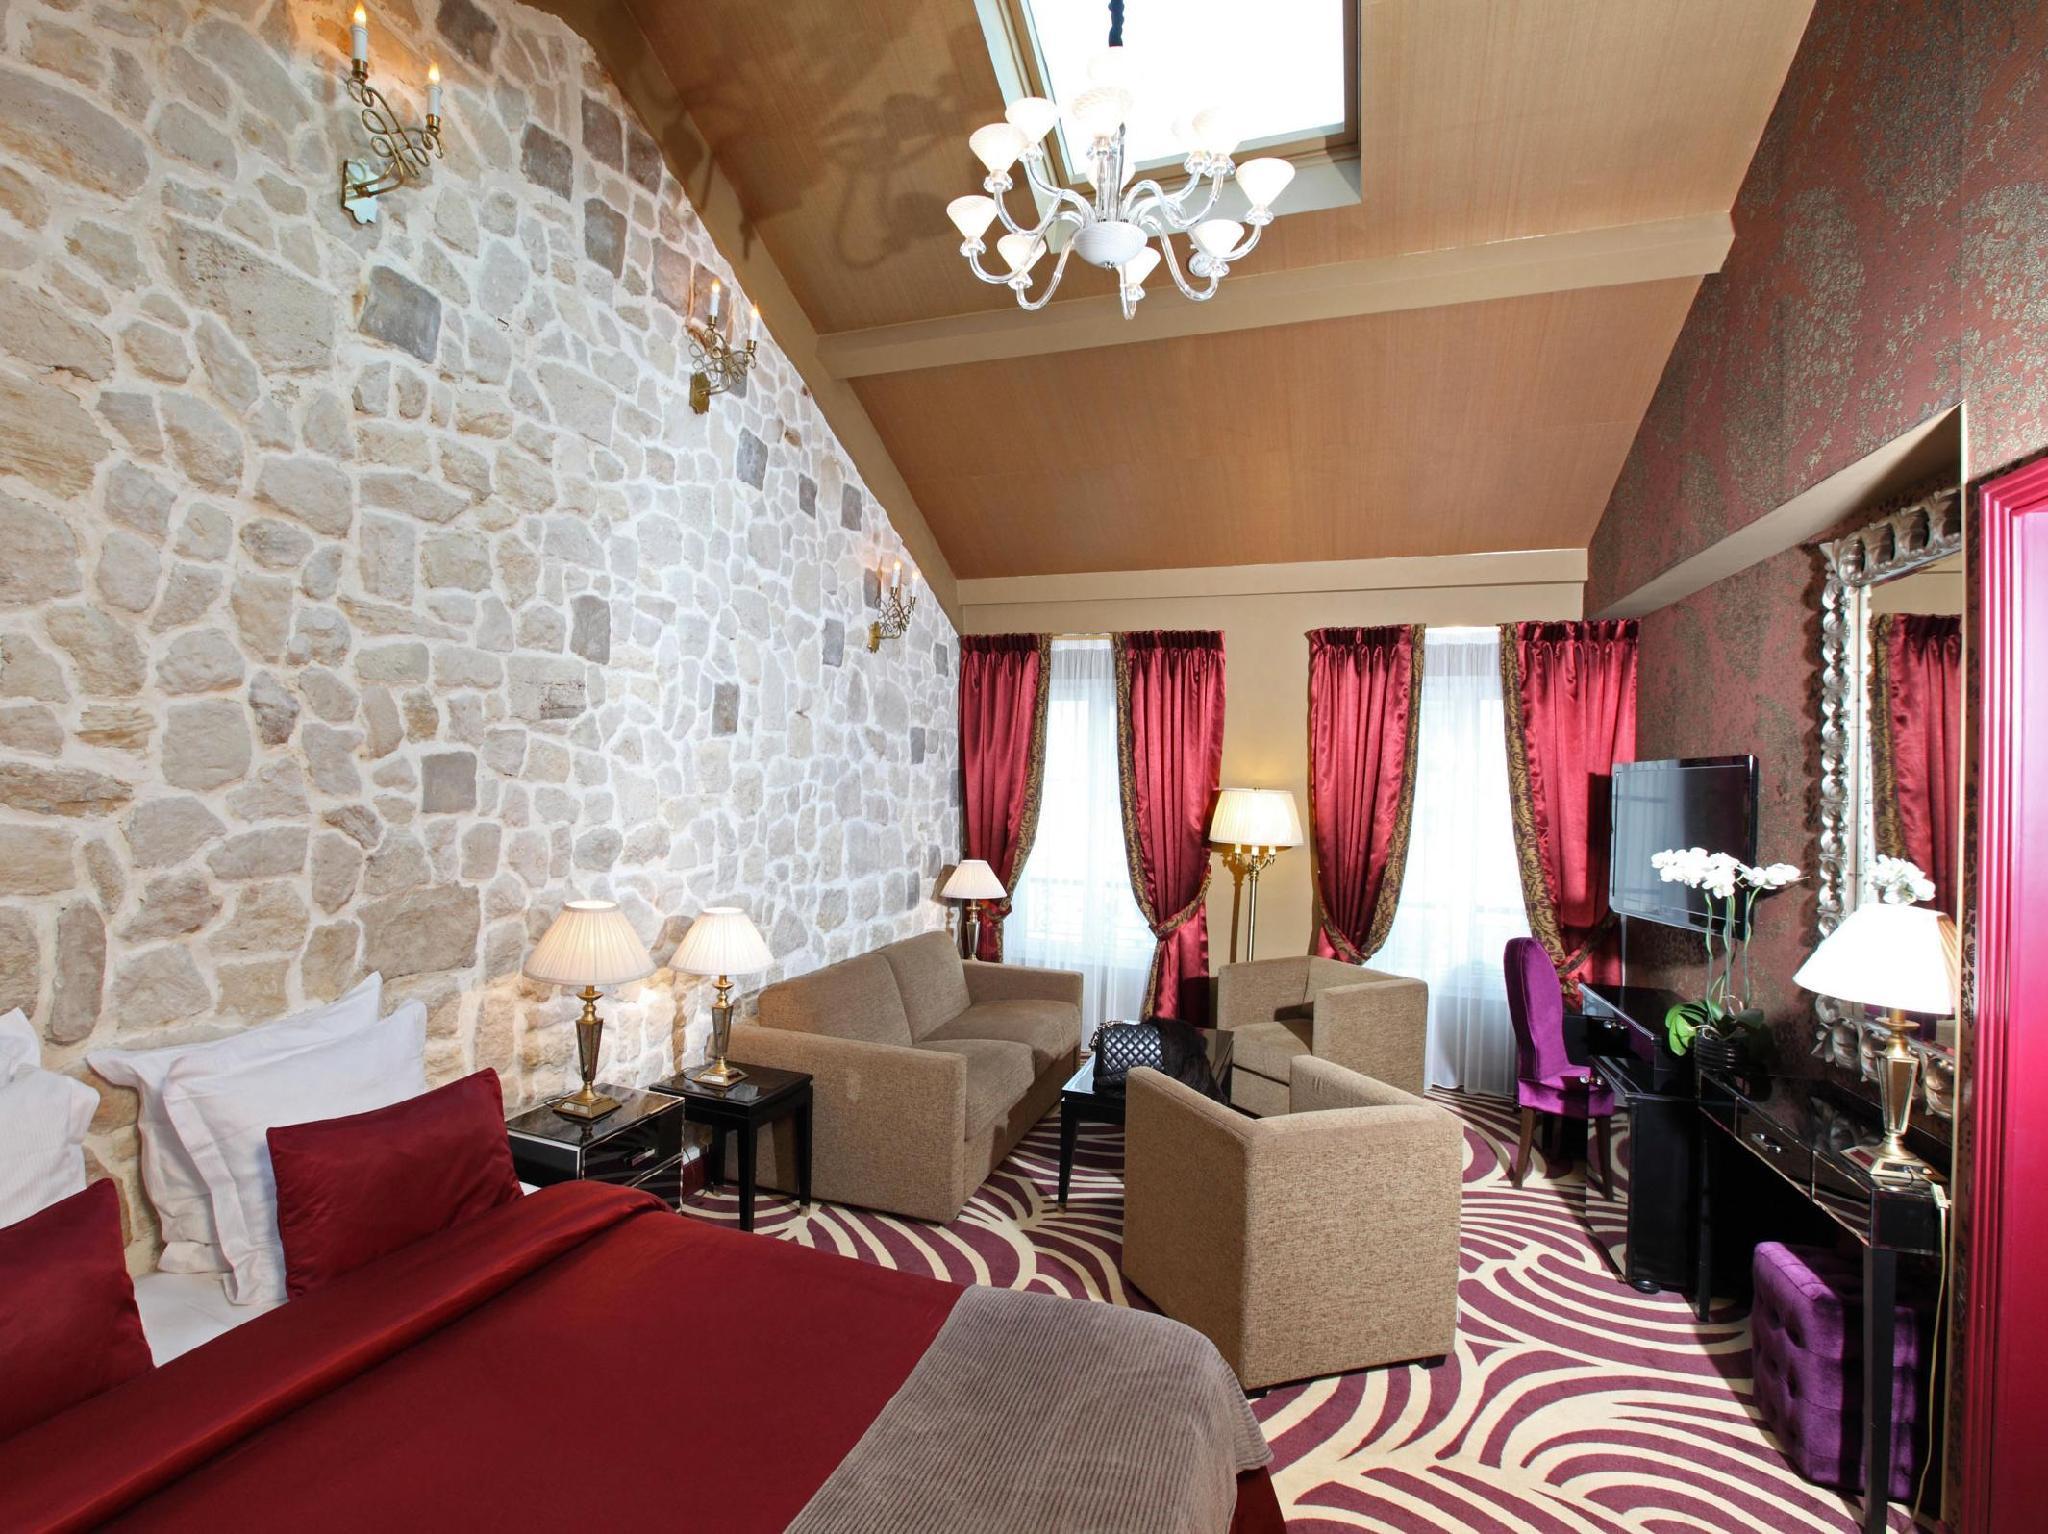 Hotel Le Squara - Hotell och Boende i Frankrike i Europa